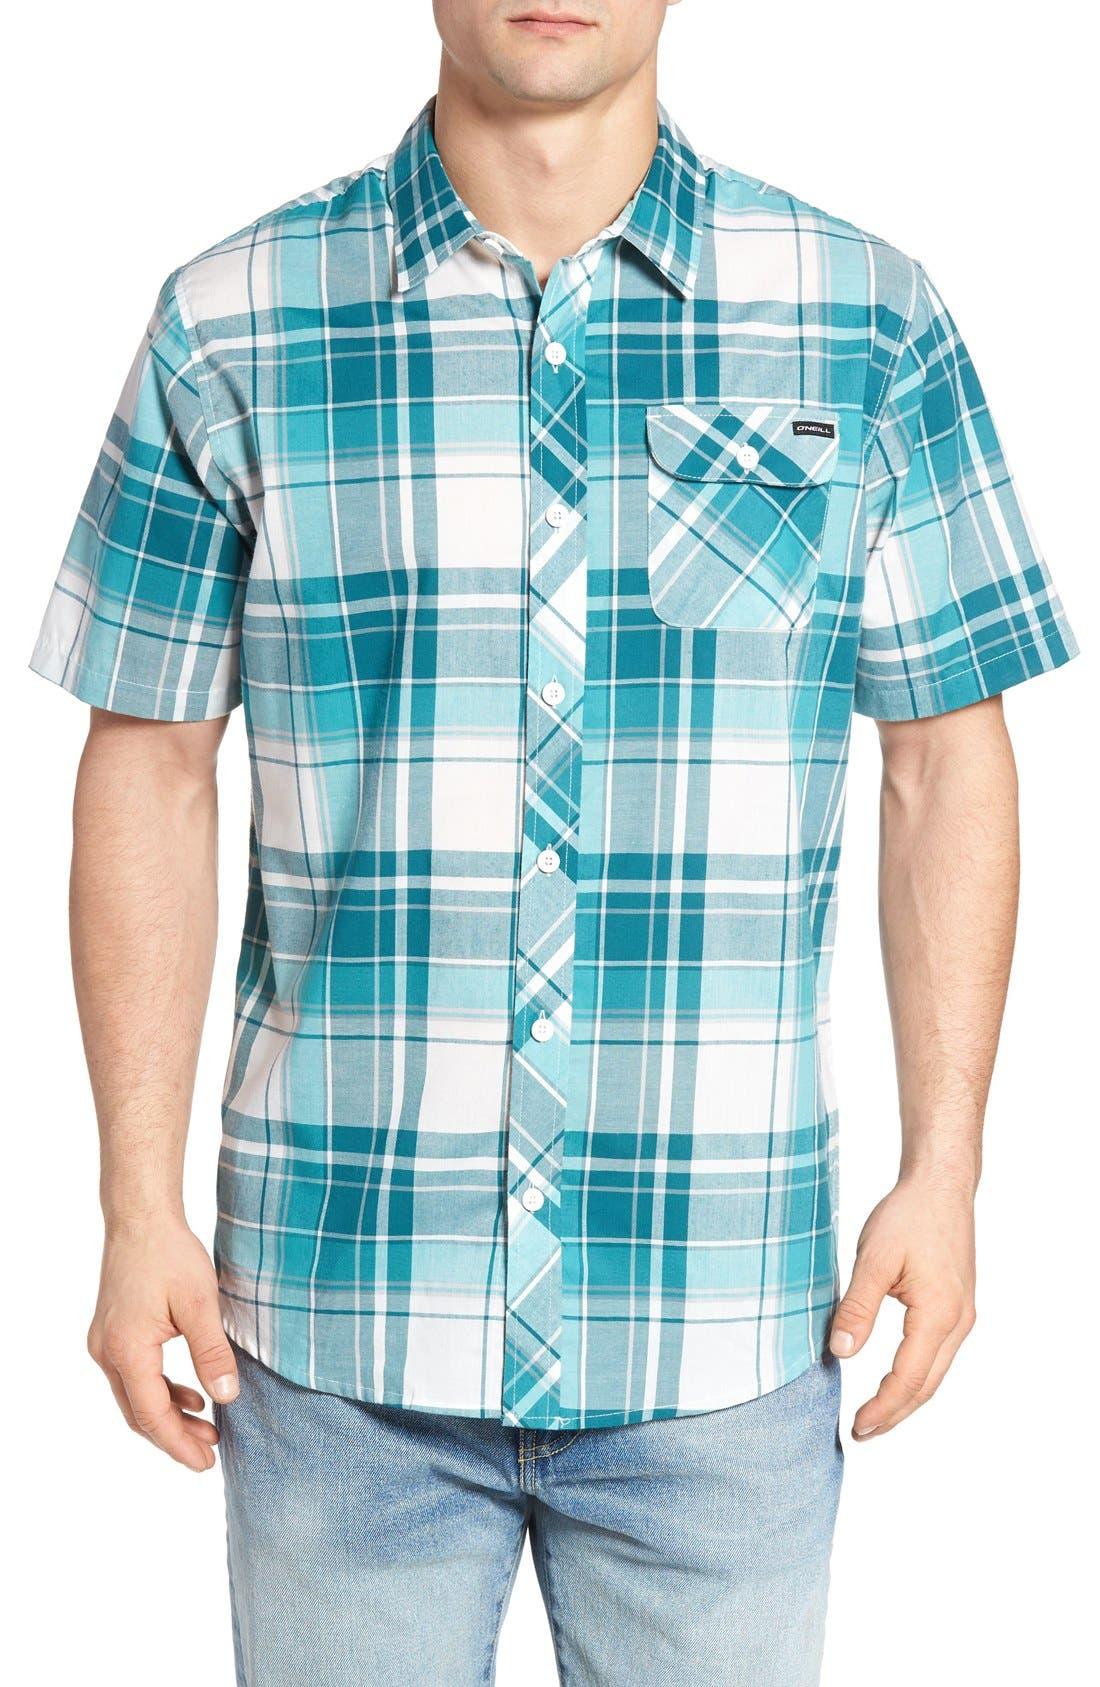 Alternate Image 1 Selected - O'Neill Plaid Woven Shirt